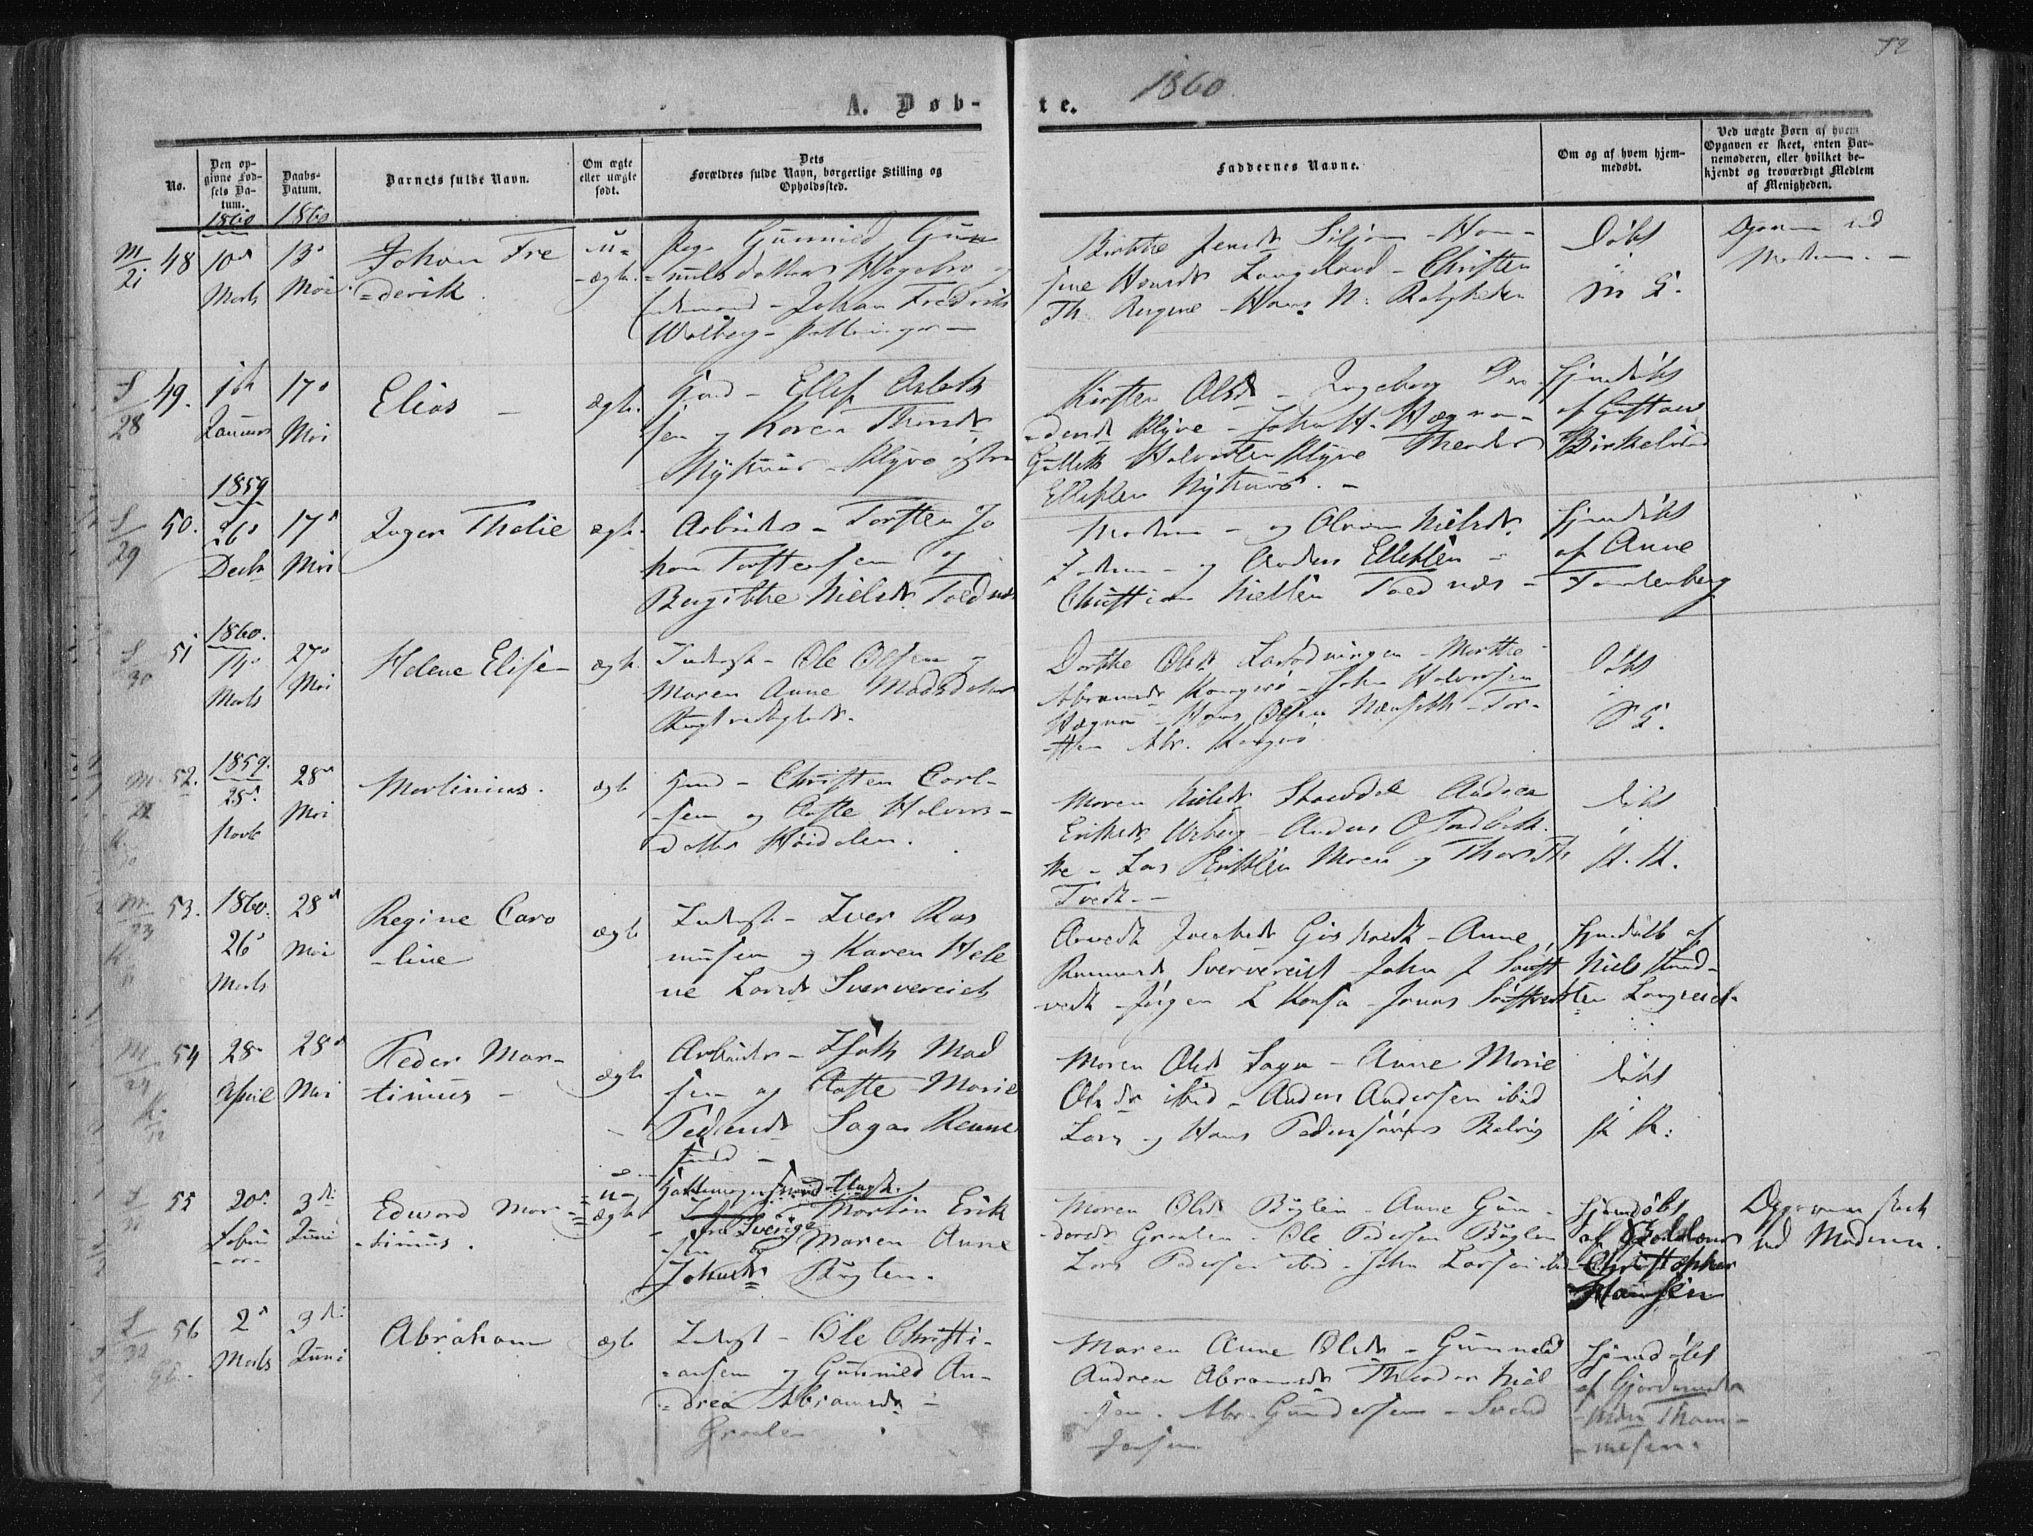 SAKO, Solum kirkebøker, F/Fa/L0007: Ministerialbok nr. I 7, 1856-1864, s. 72